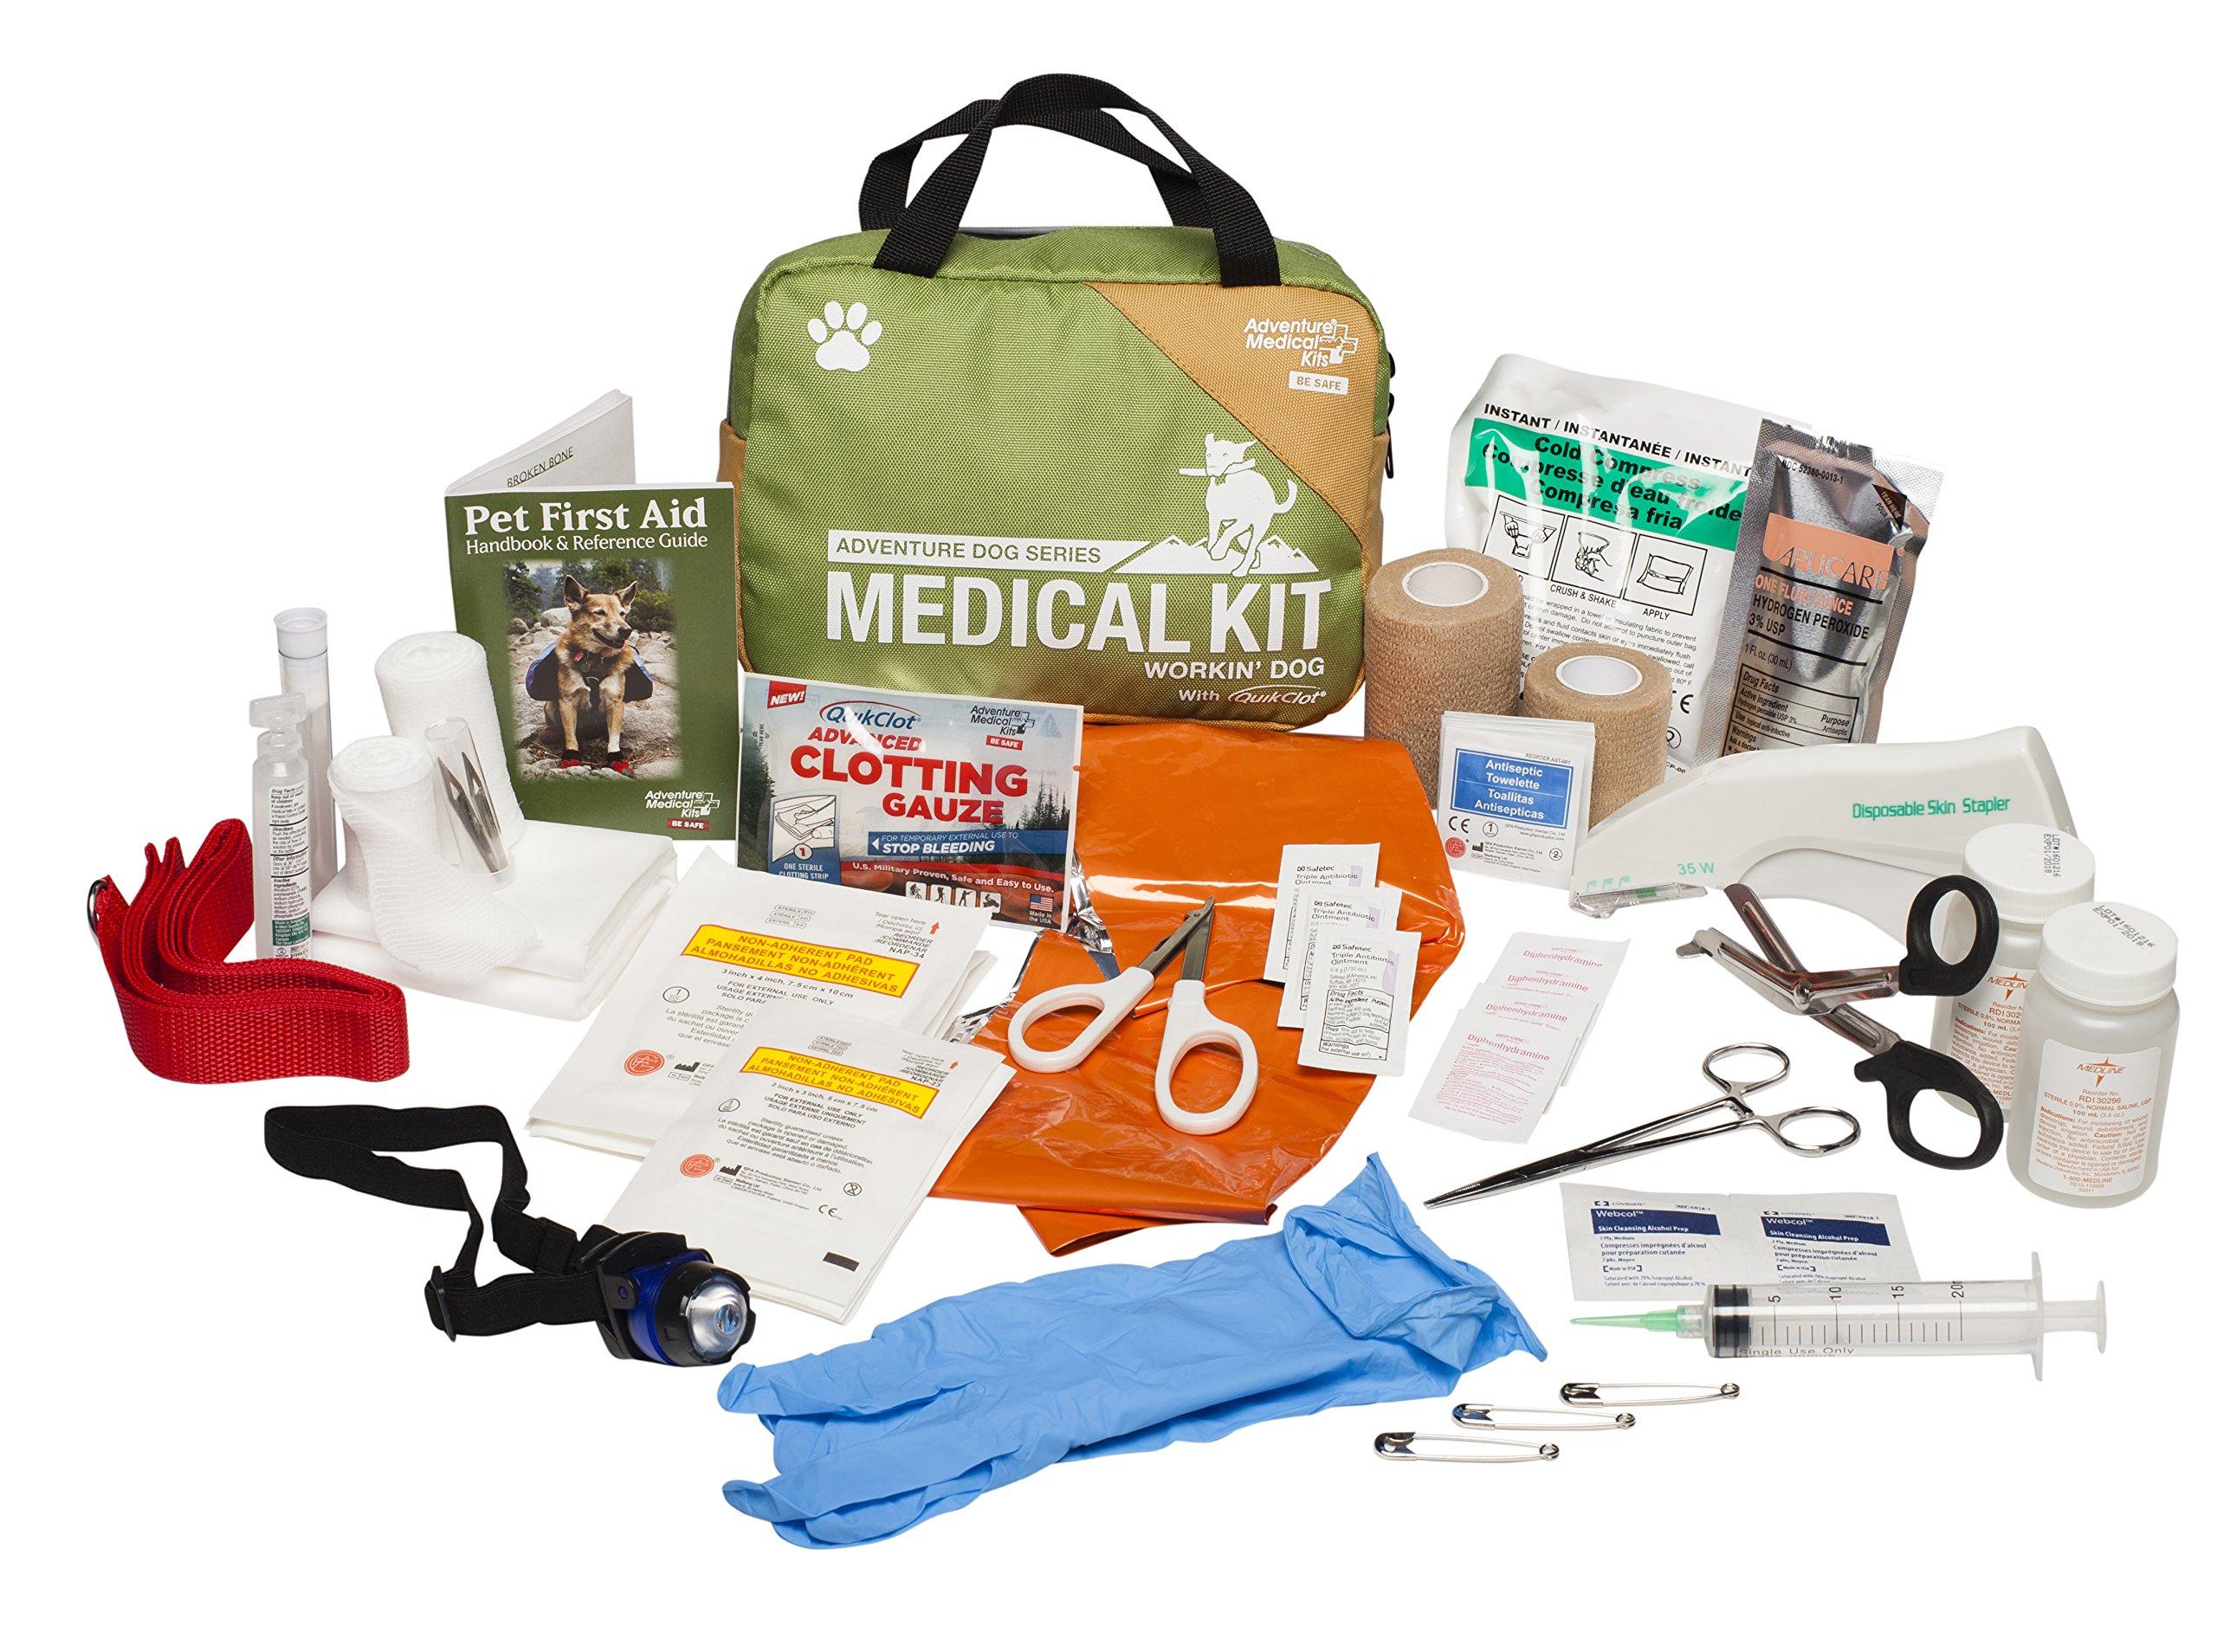 Adventure Medical Kits Adventure Dog Series, Workin' Dog, 2.3125 Pounds